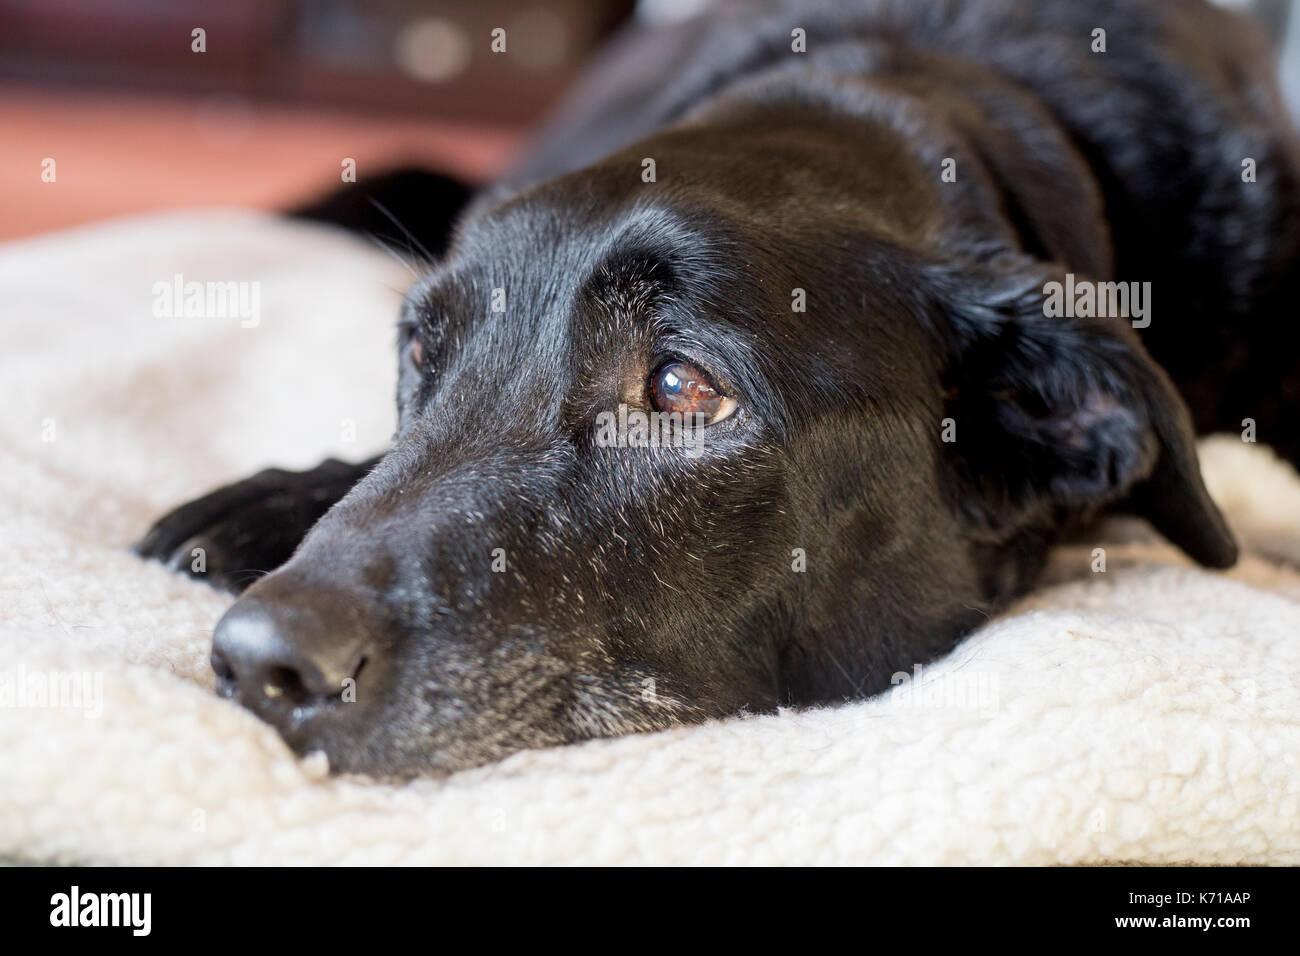 An elderly black labrador rests on a white fleece - Stock Image